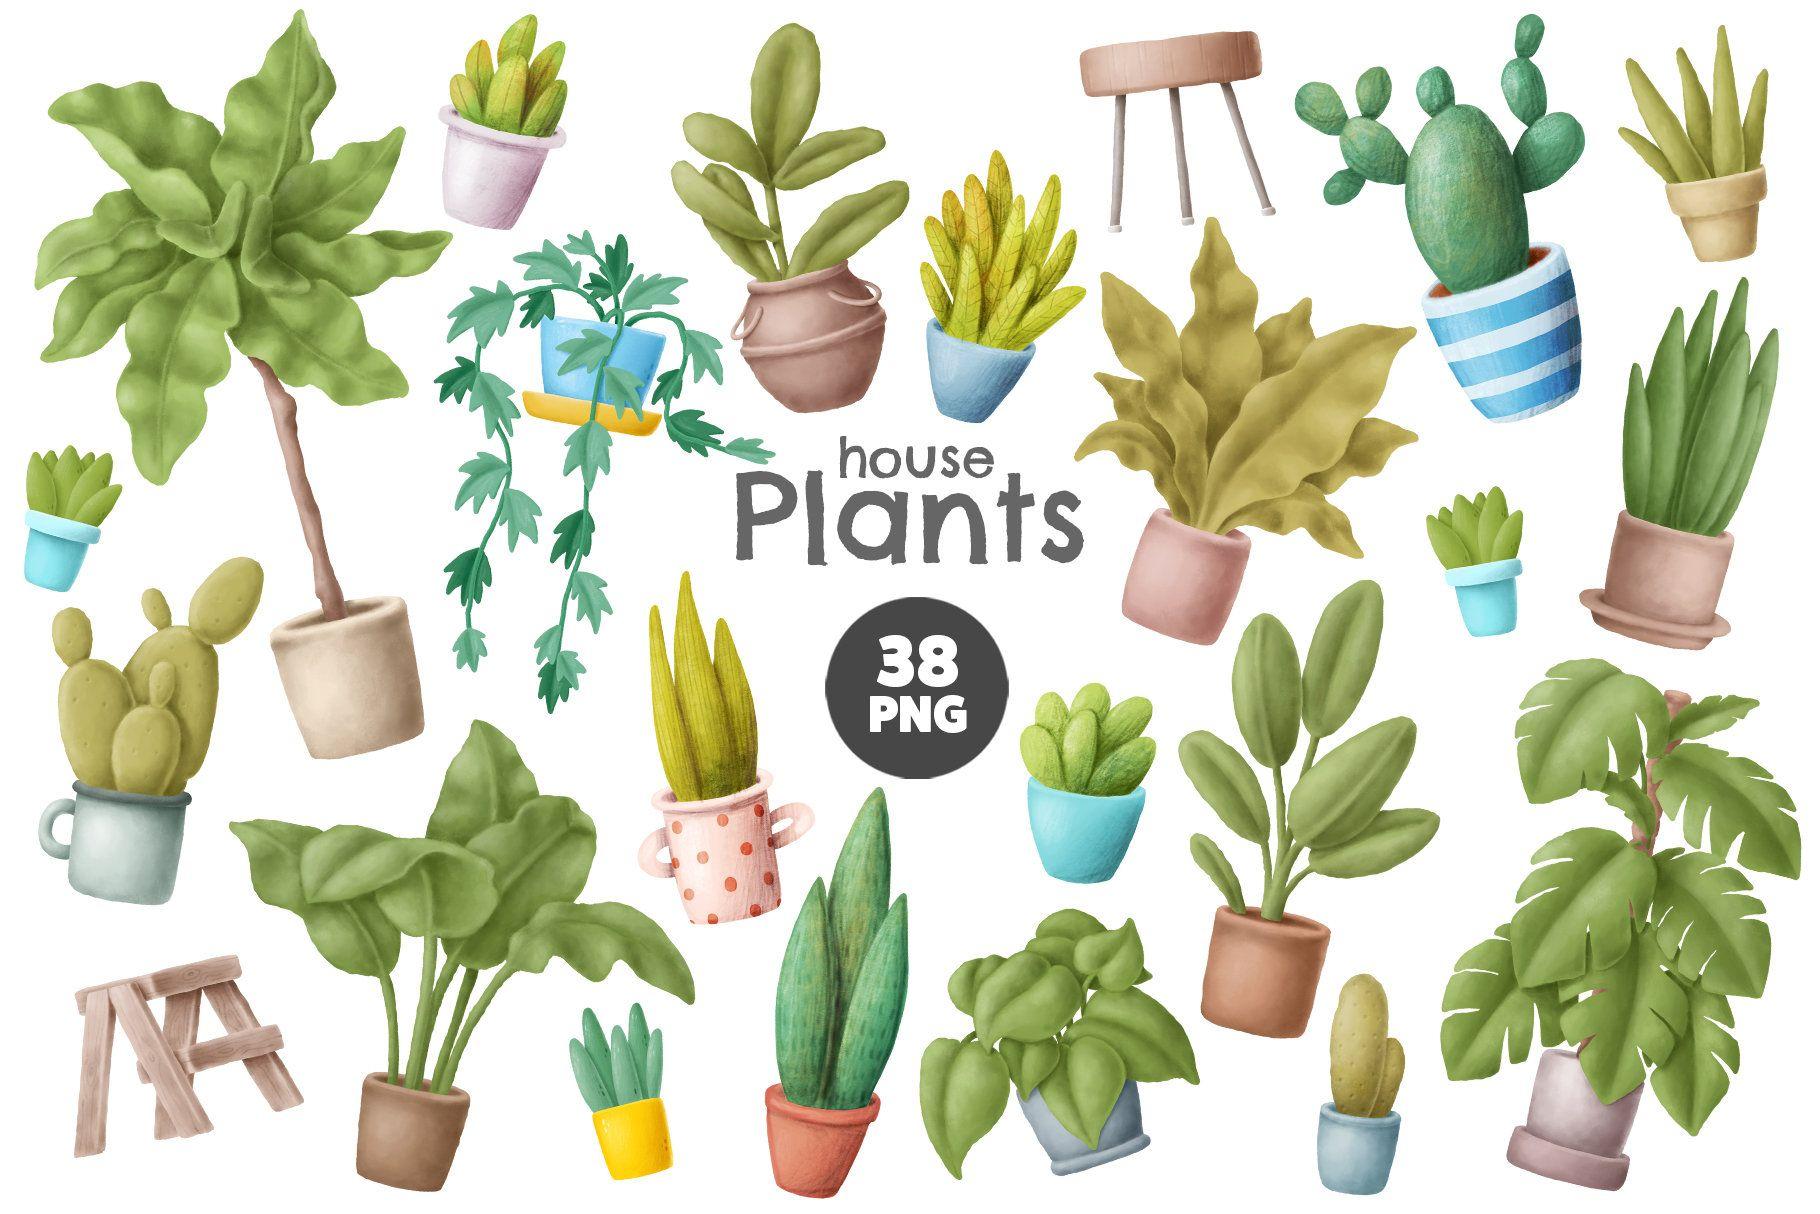 House Plants Clipart - Flower Pot Illustration - Png Download (#1226415) -  PikPng